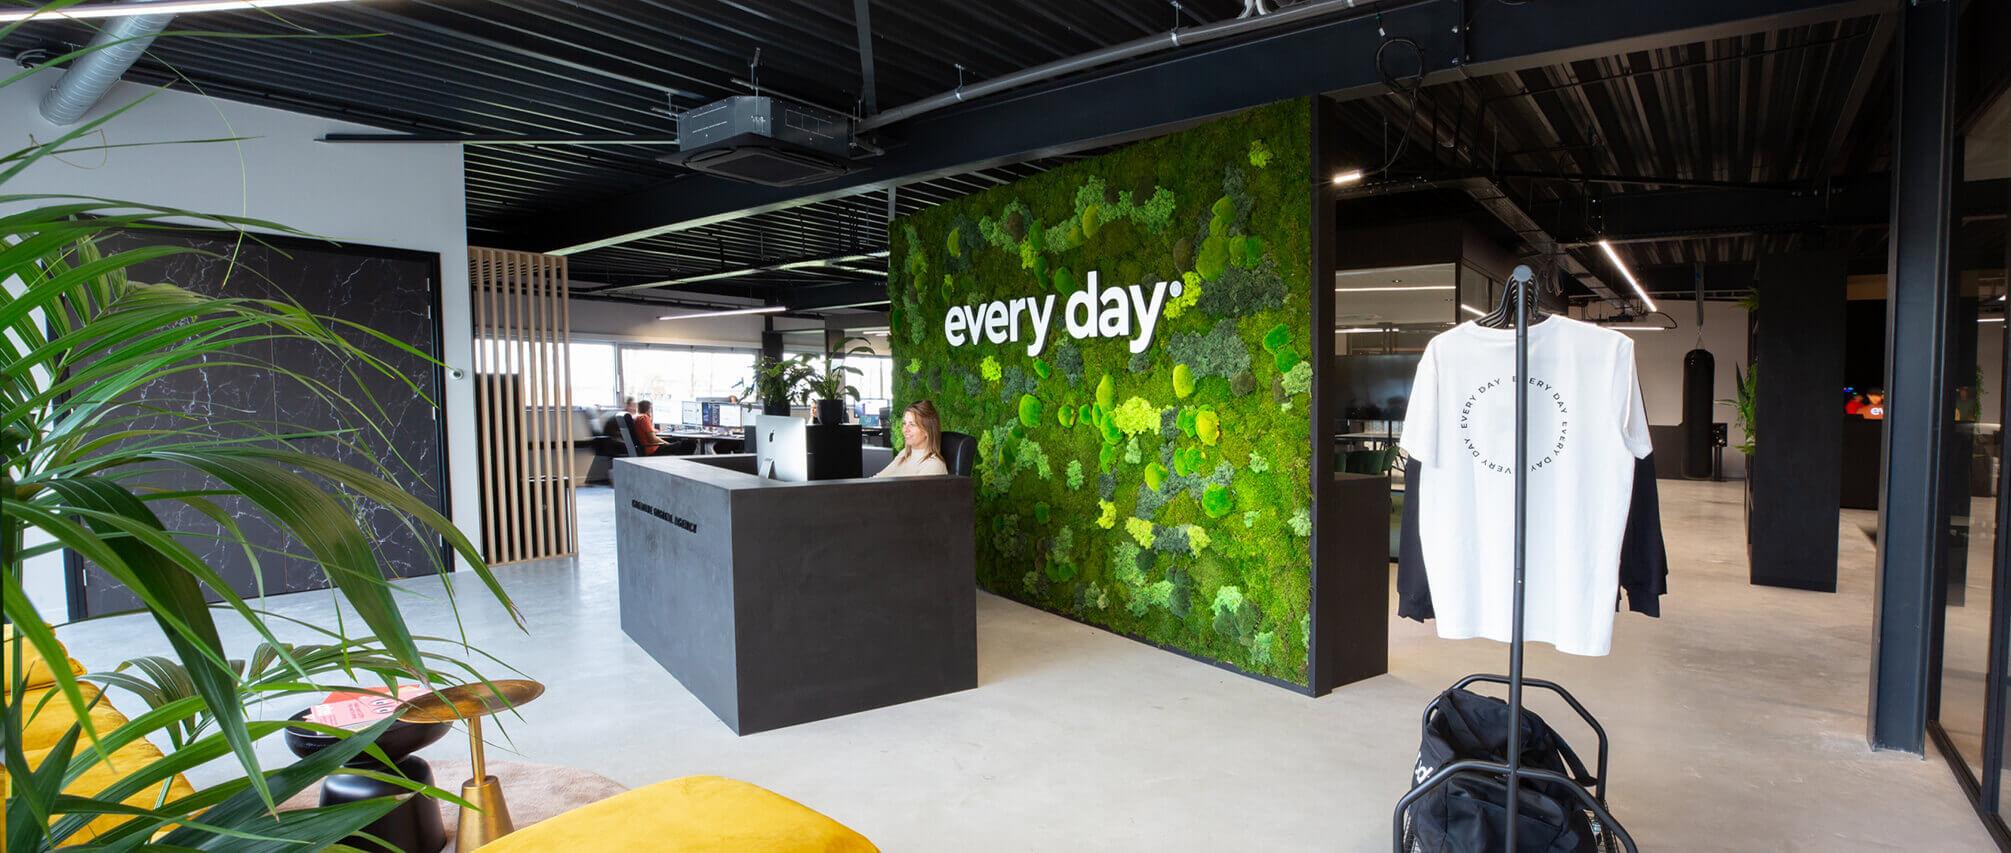 Internetbureau Breda